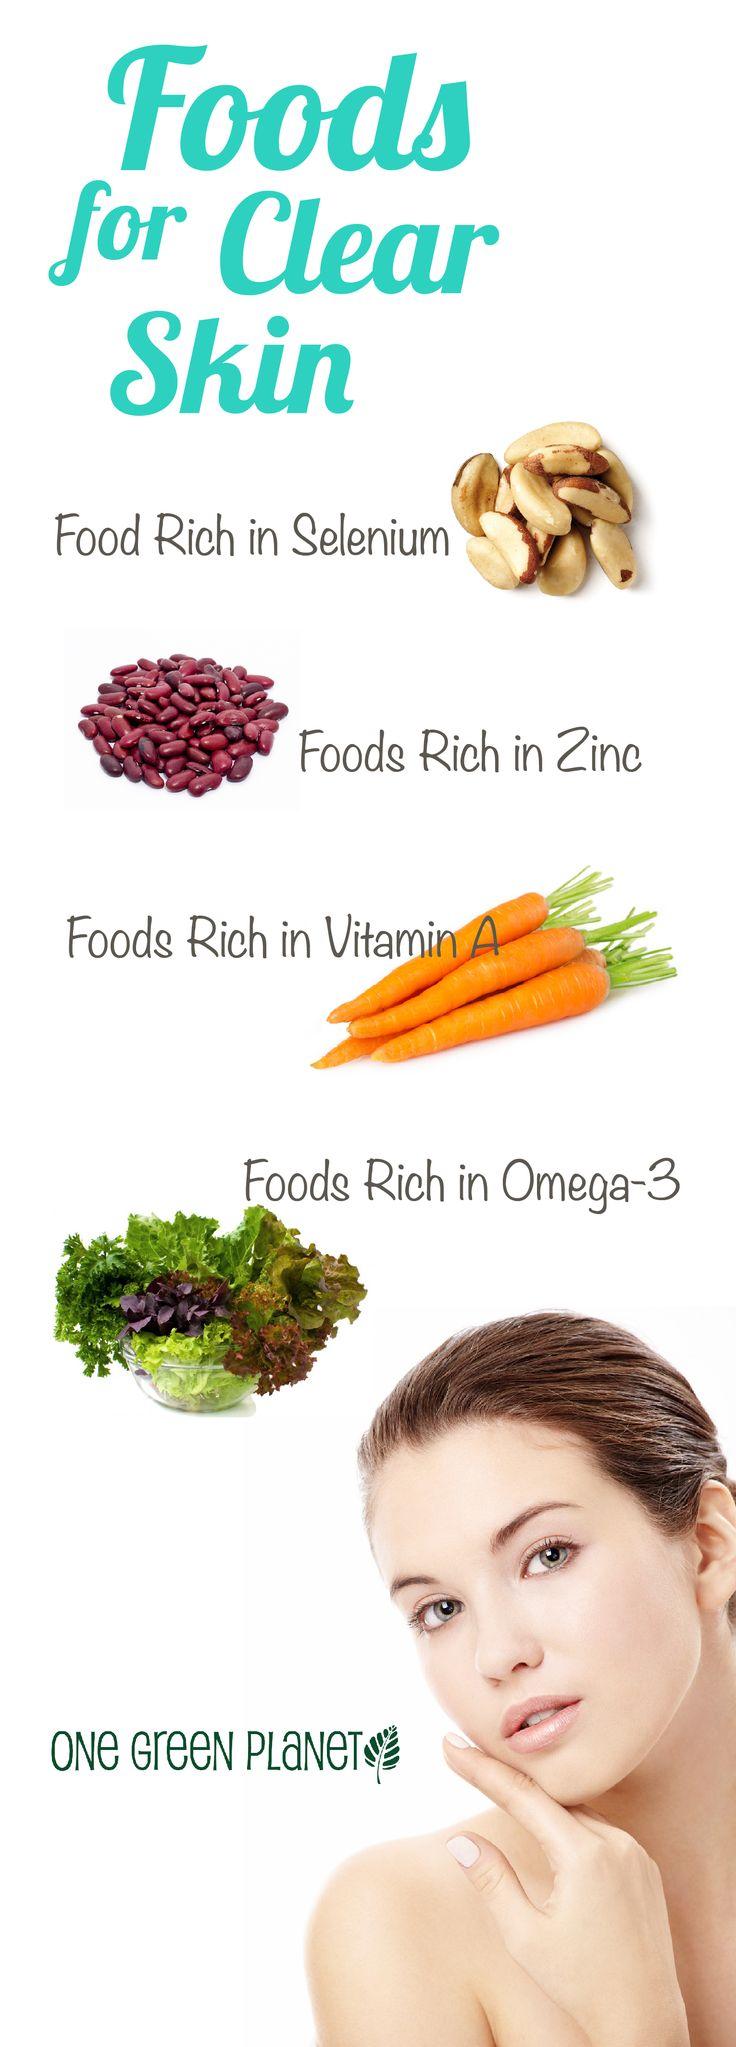 What Is a Vegan Diet? Vegan Facts, Benefits & Precautions